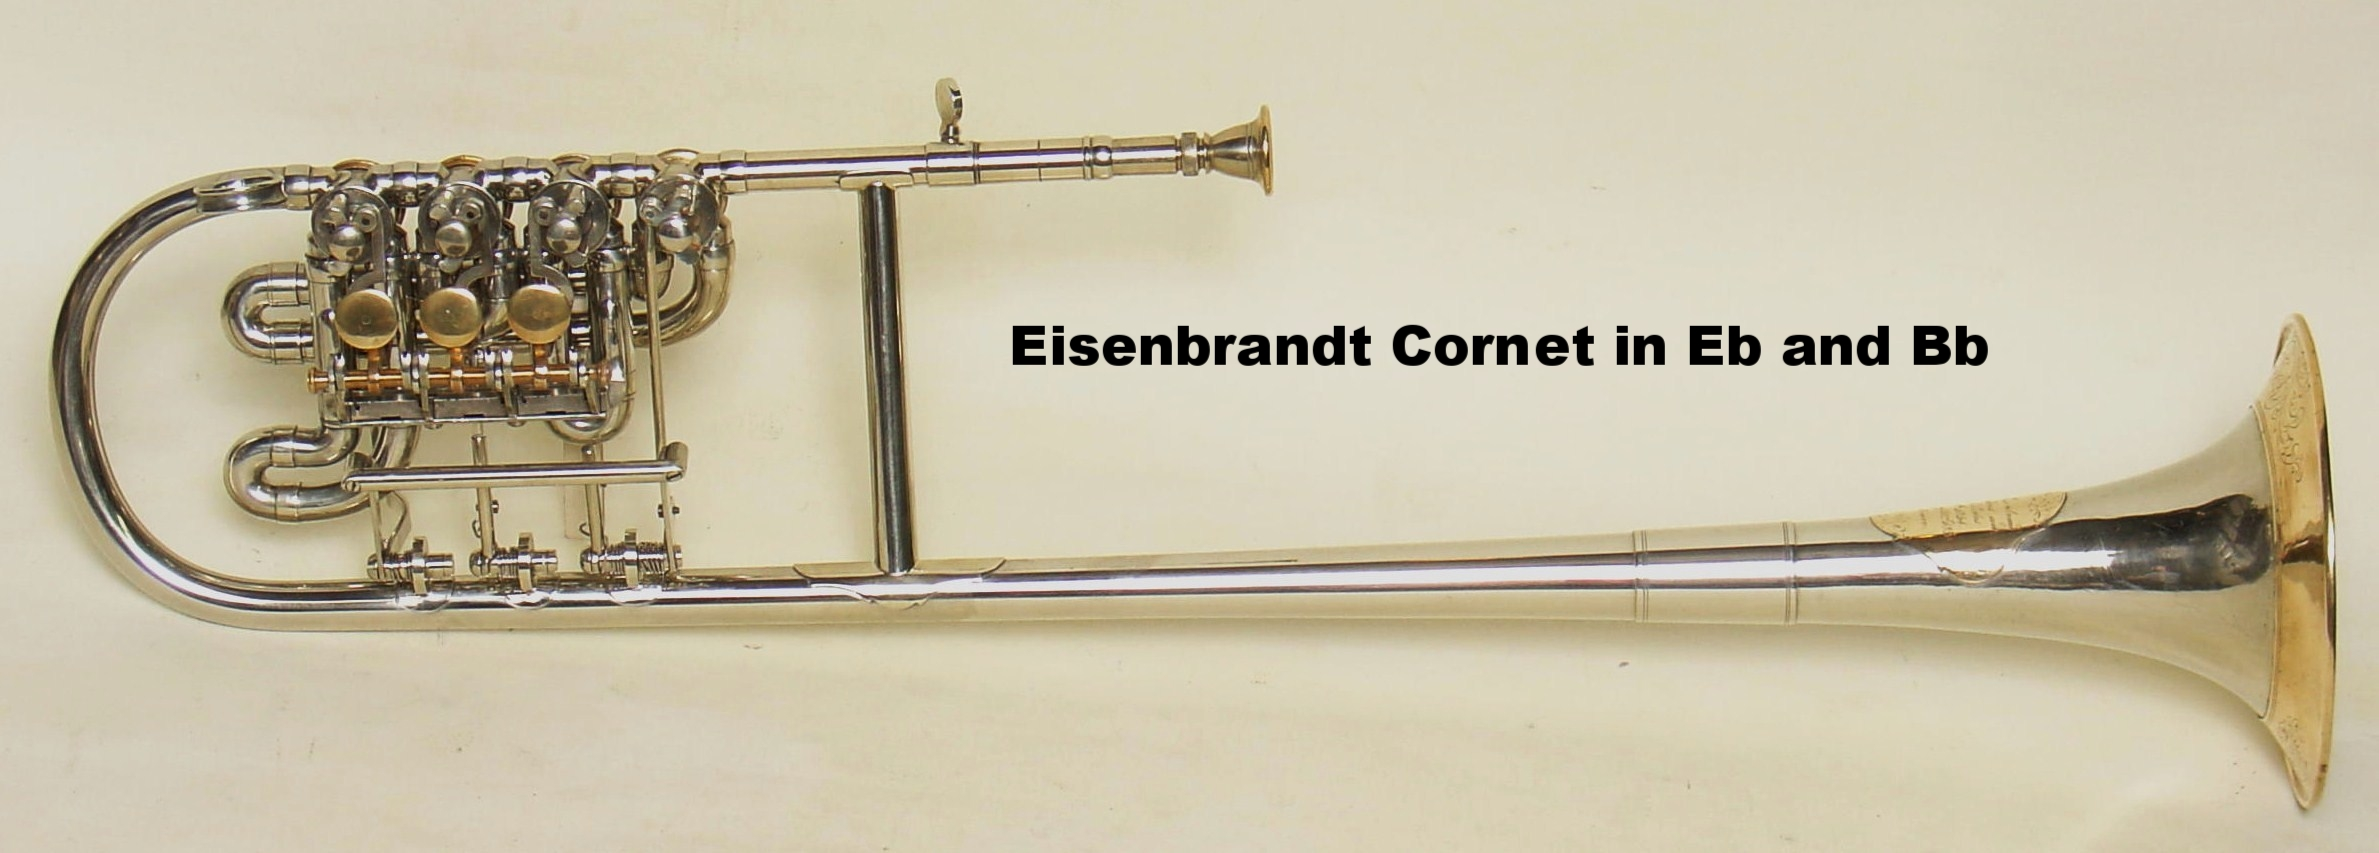 Eisenbrandt Cornet in Eb and Bb